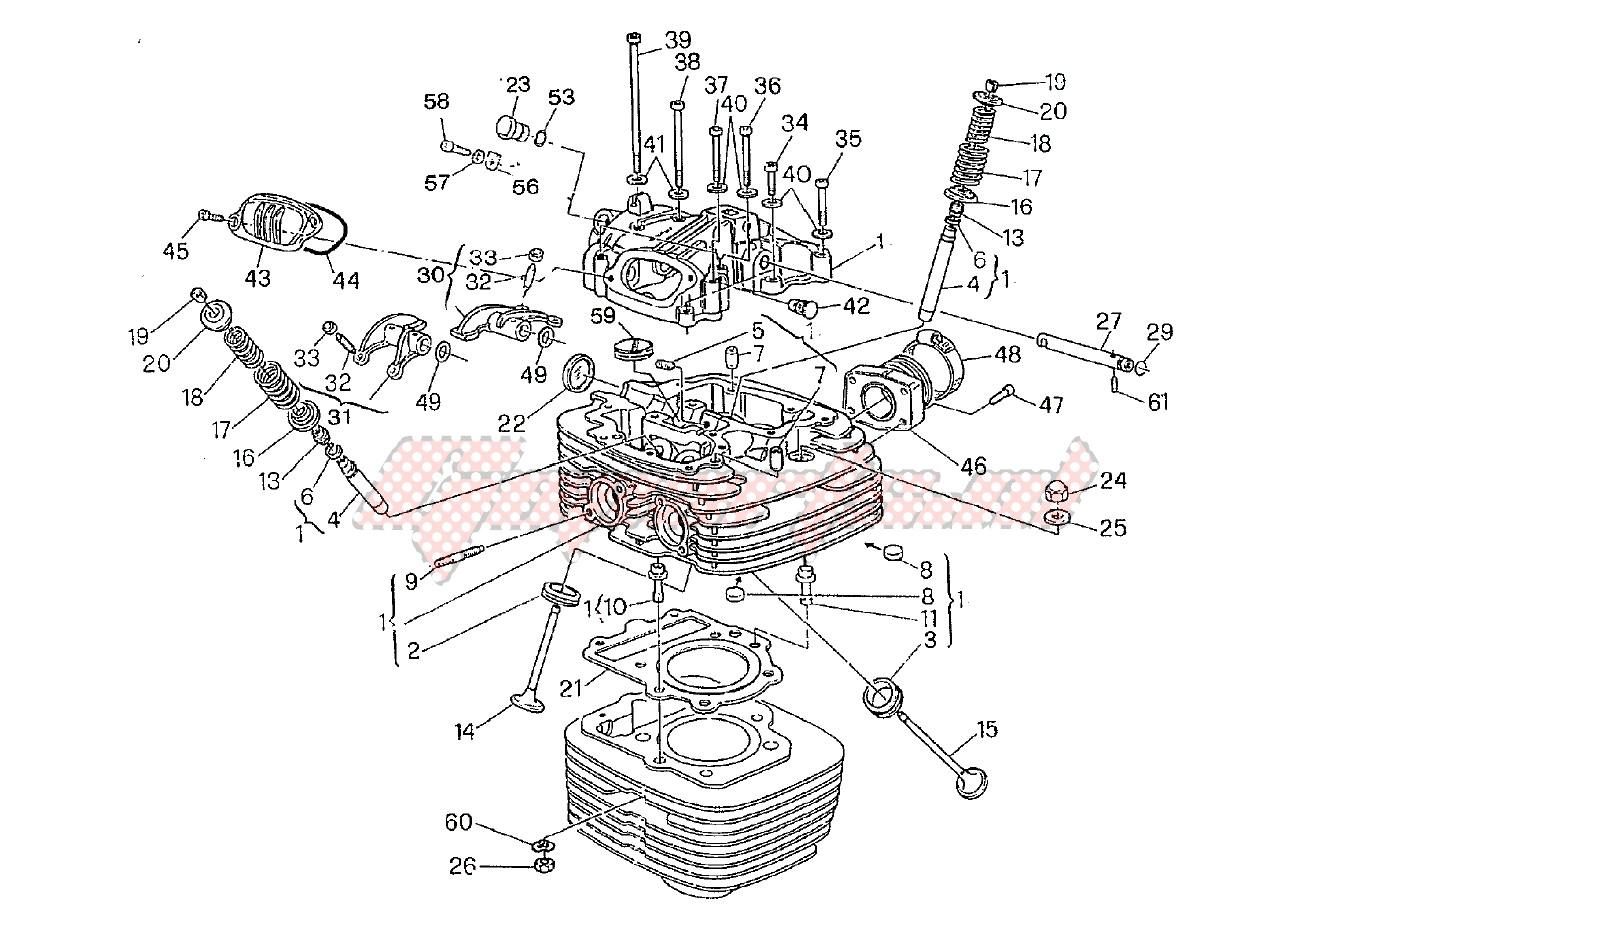 w12 engine diagram w12 engine diagram wiring diagrams site  w12 engine diagram wiring diagrams site